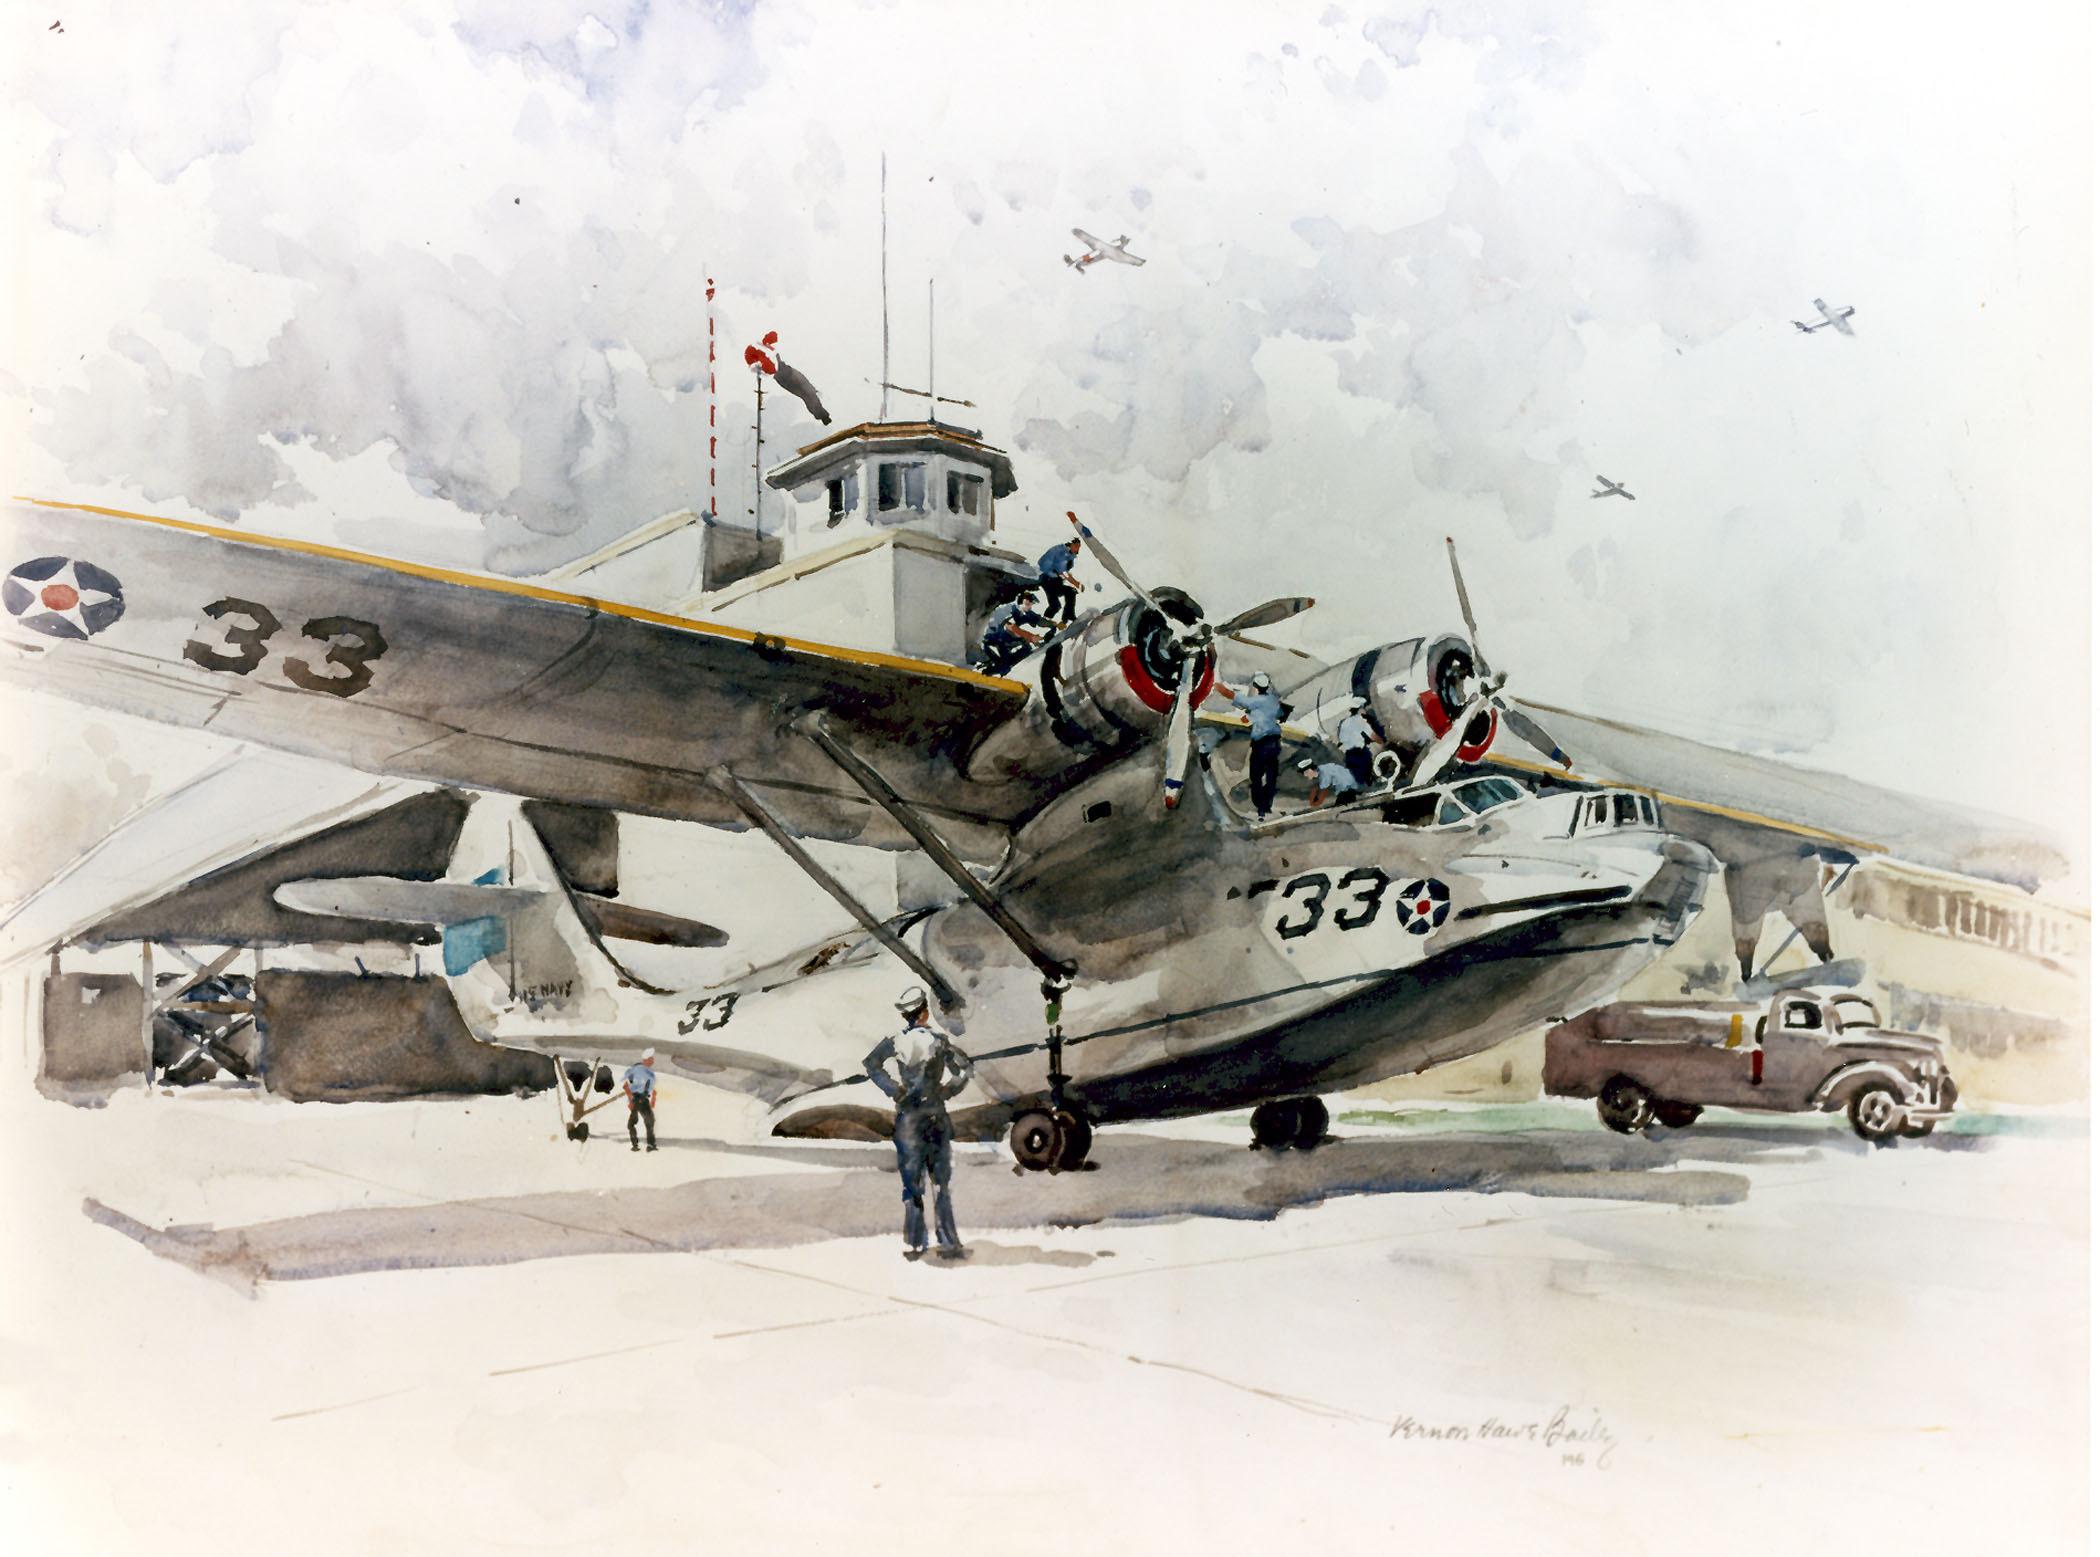 Patrol Plane 33.